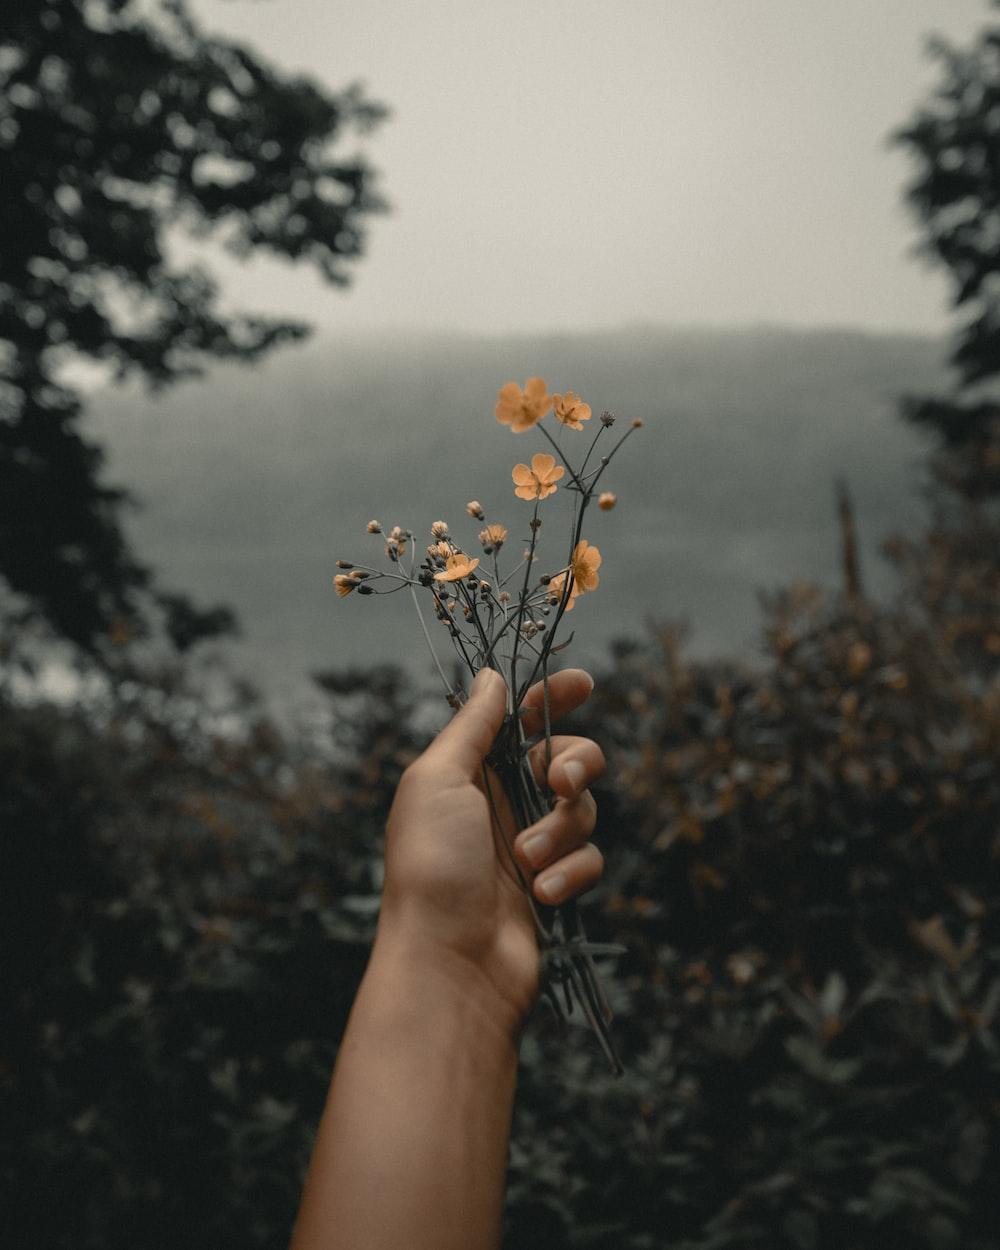 person holding orange-petaled flowers